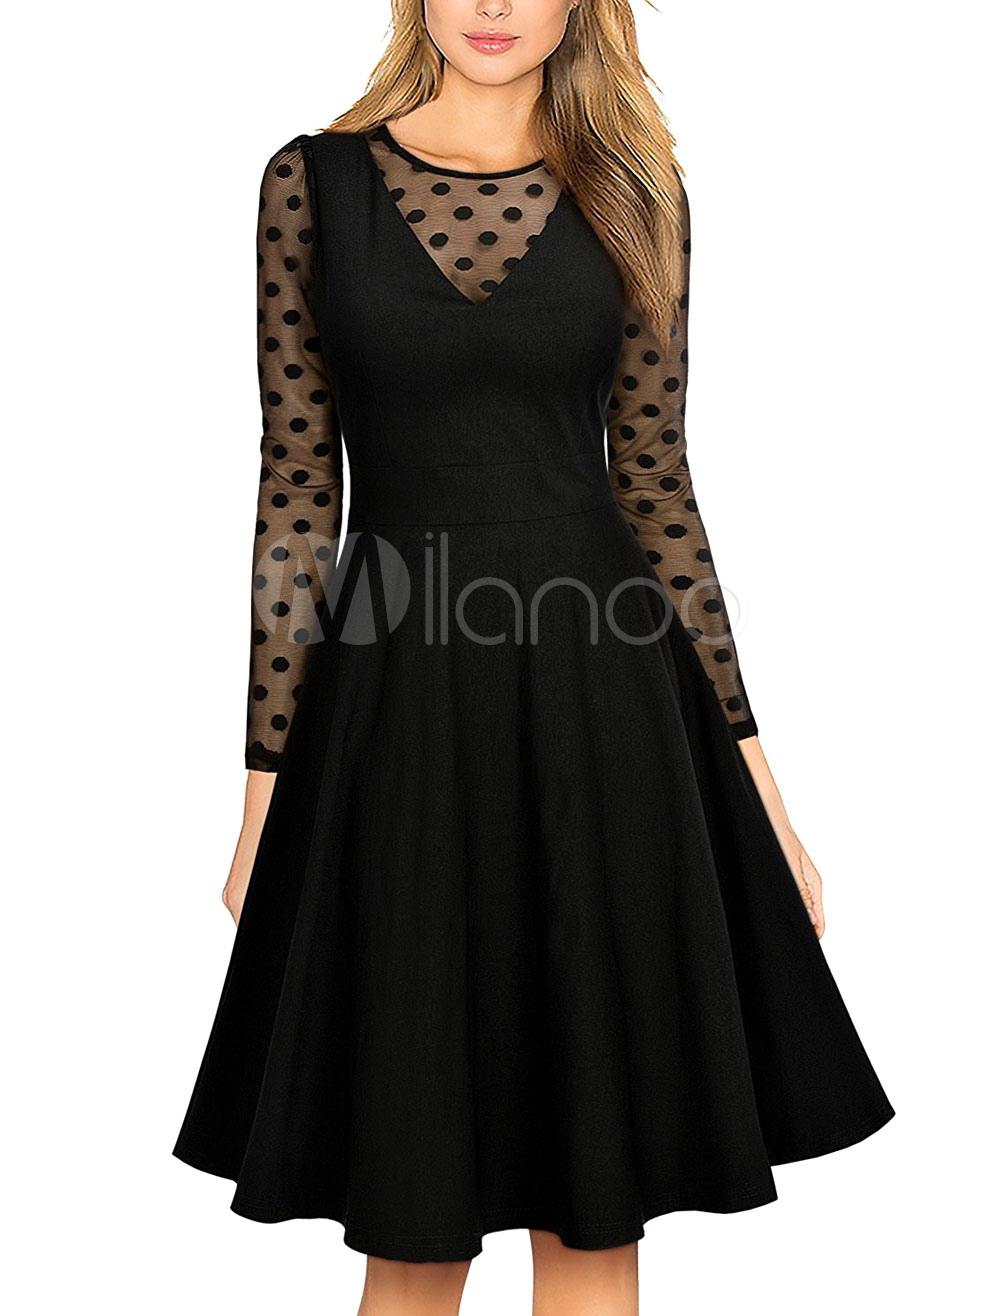 c83d3ed0a97 ... Black Vintage Dress Round Neck Long Sleeve Semi Sheer Polka Dot Print Pleated  Dresses For Women ...